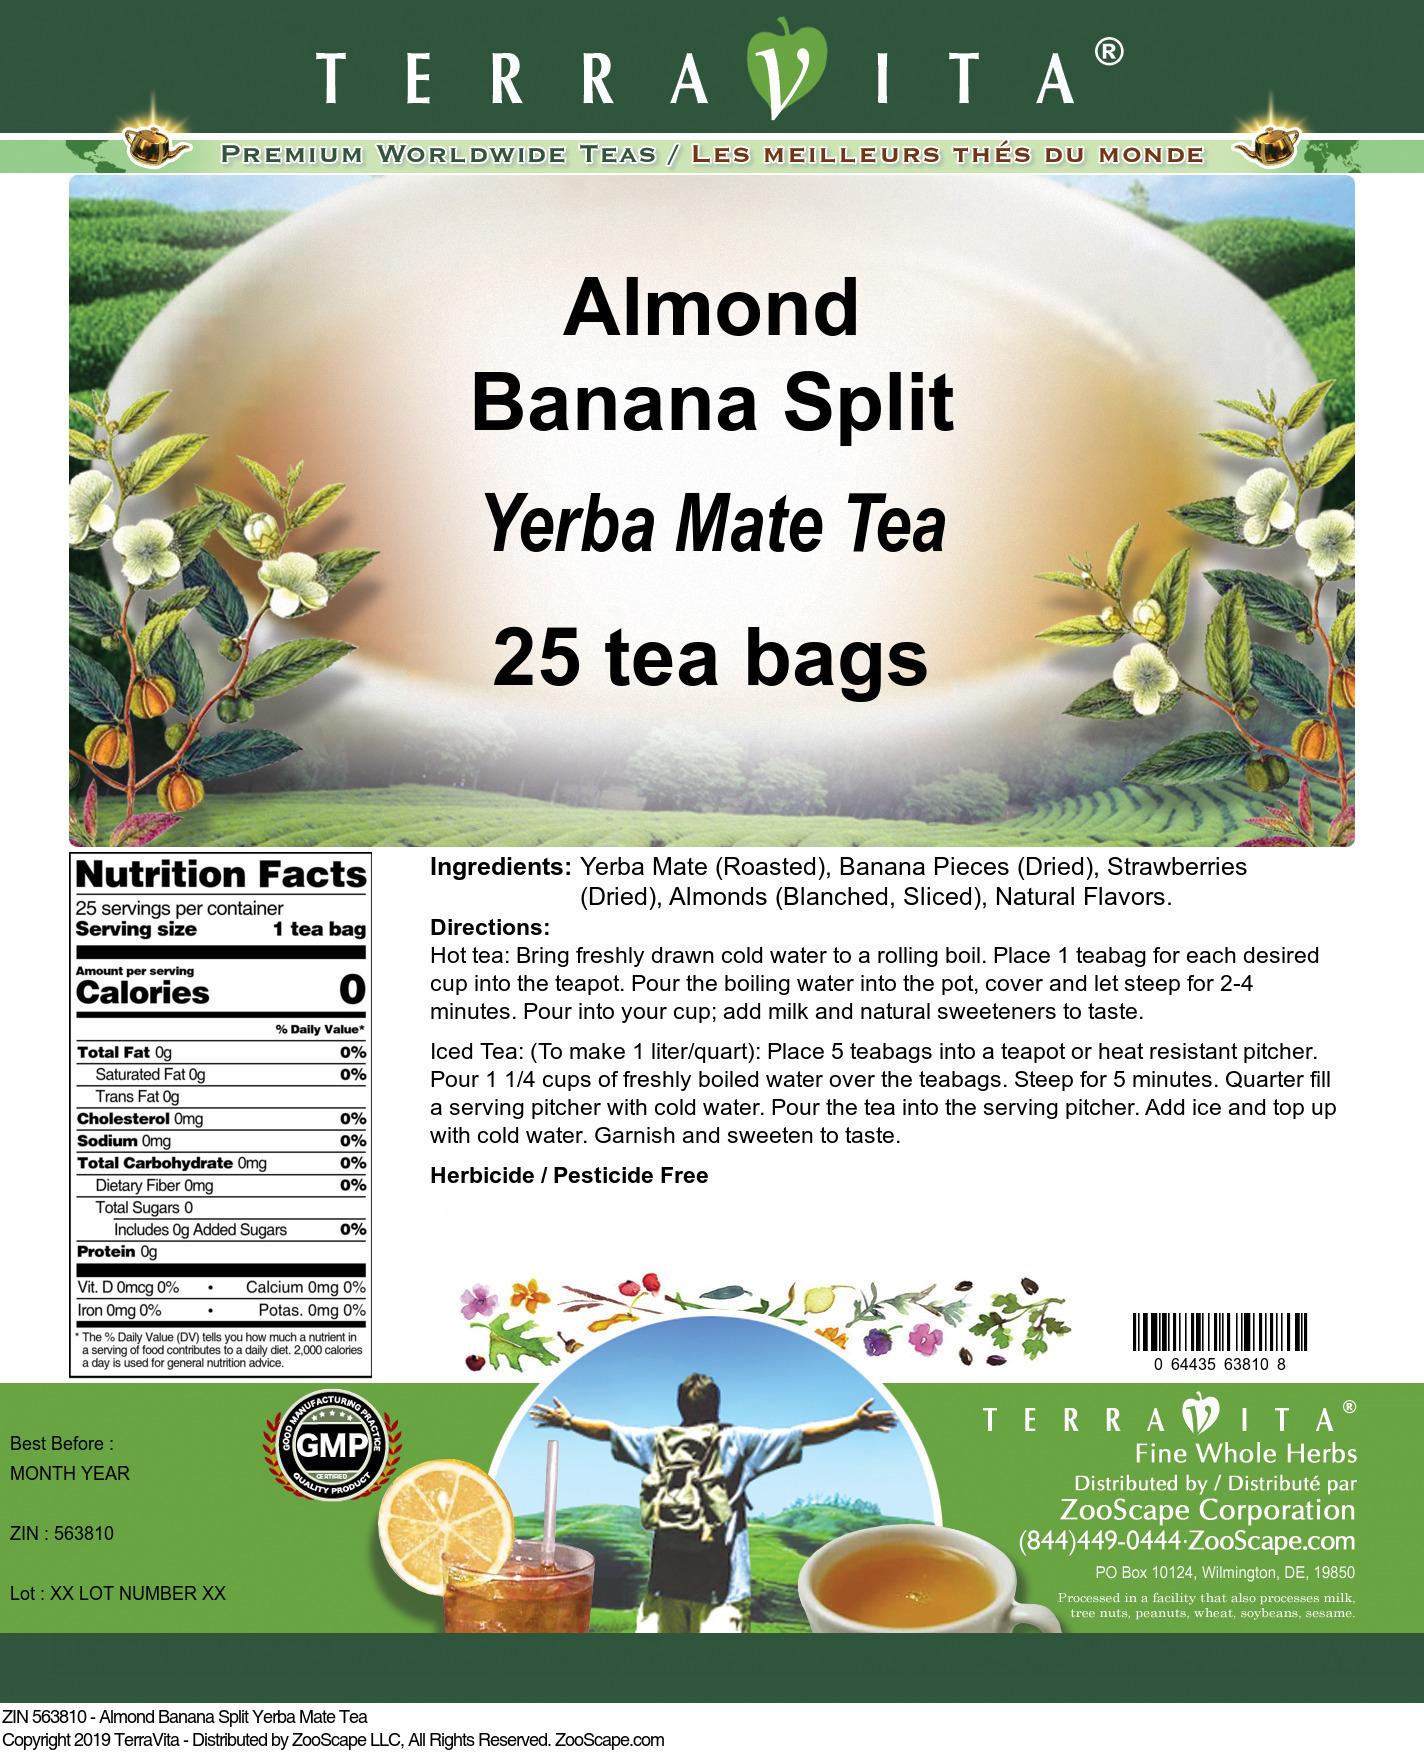 Almond Banana Split Yerba Mate